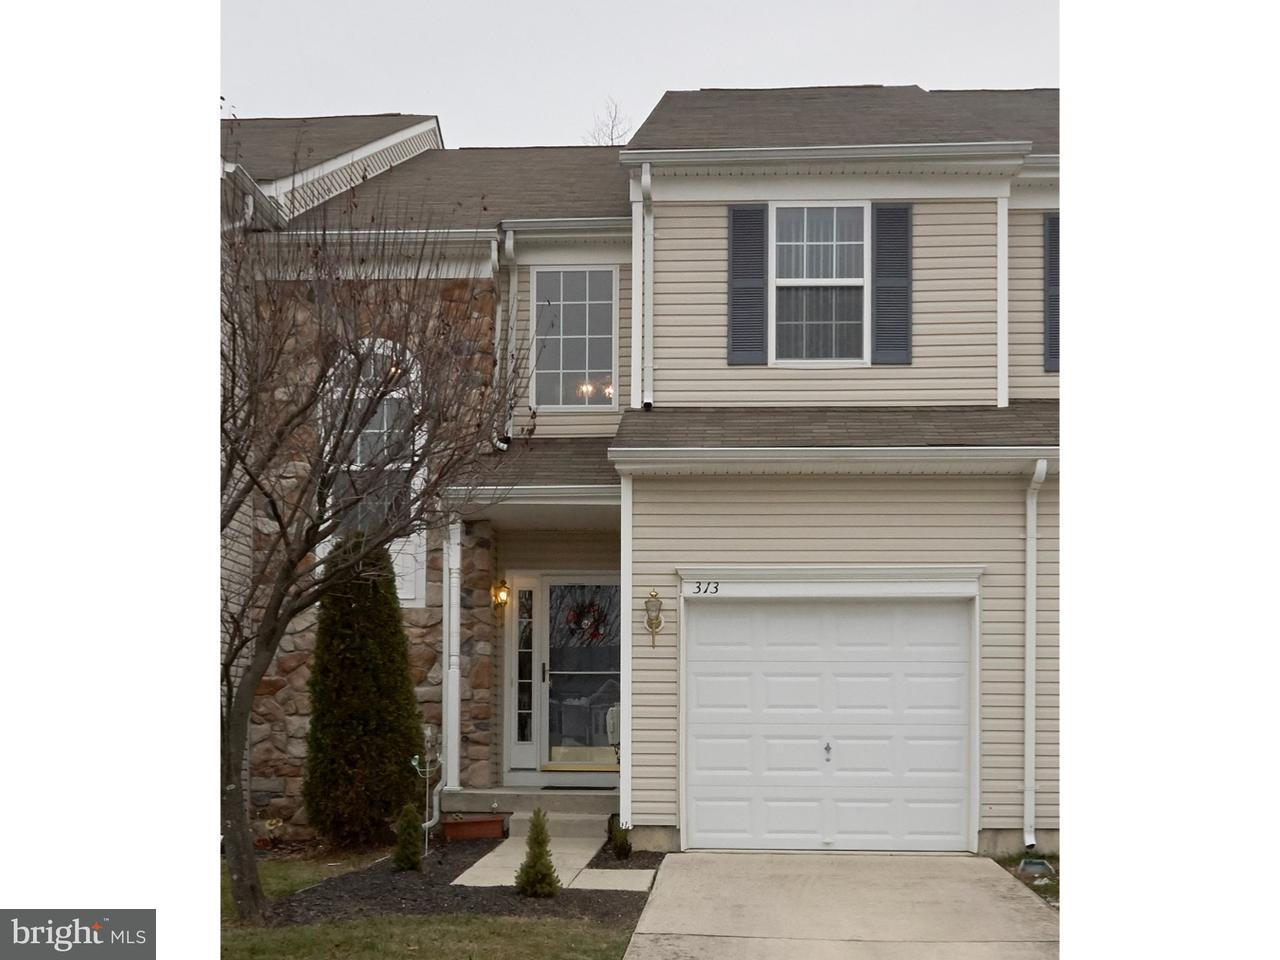 联栋屋 为 销售 在 313 CHANCELLOR Drive Deptford Township, 新泽西州 08096 美国